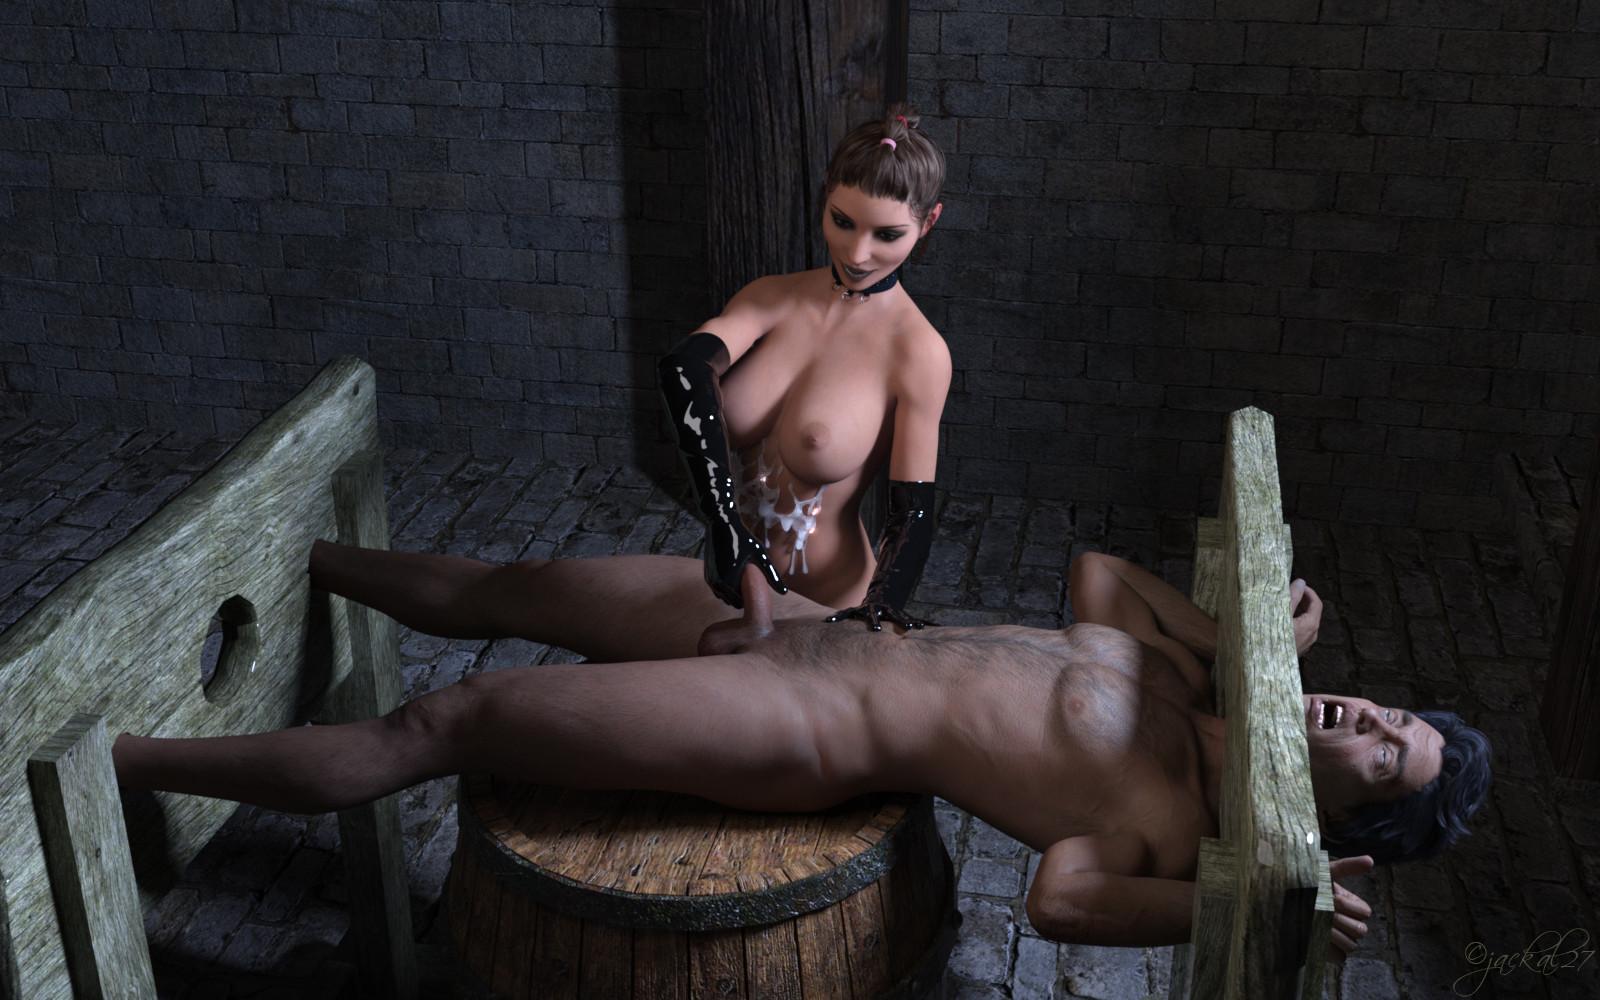 girls wiping their vaginas naked